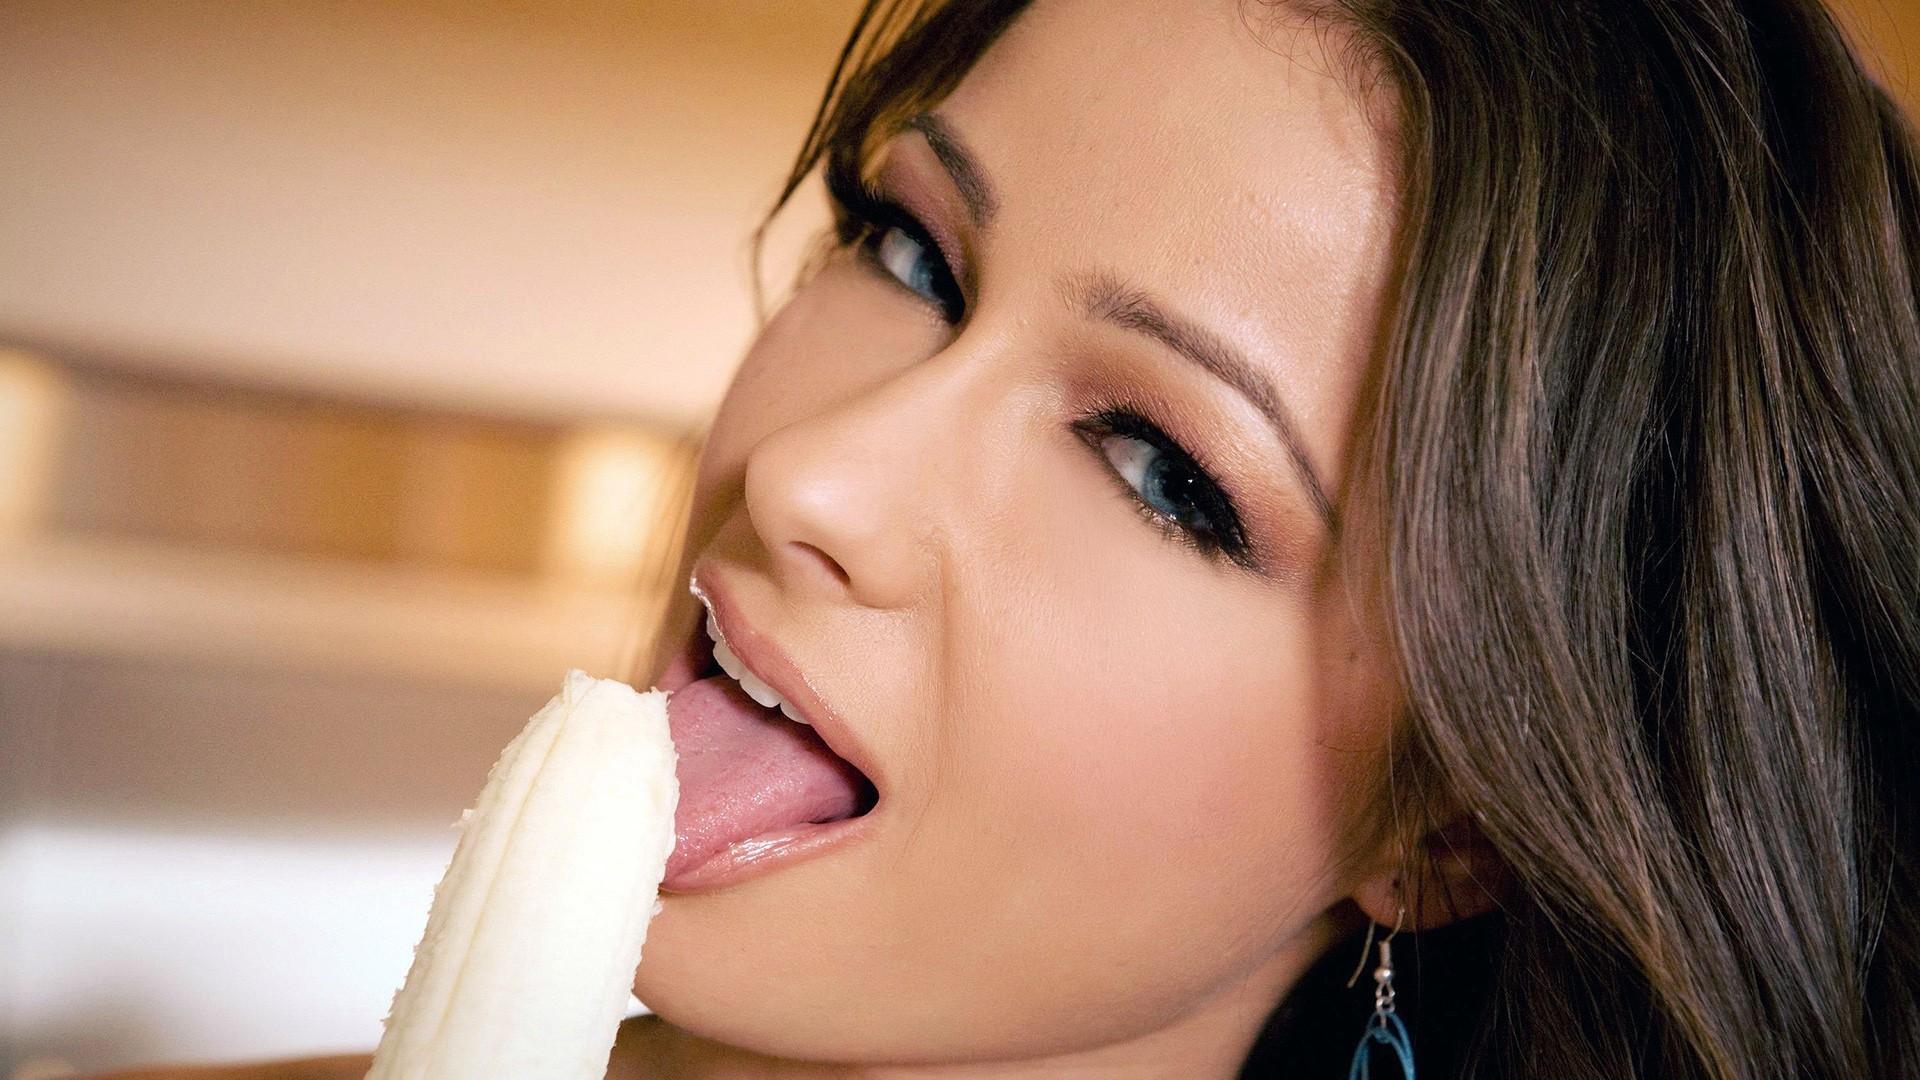 People 1920x1080 women licking Kristina Uhrinova innuendo bananas phallic symbol